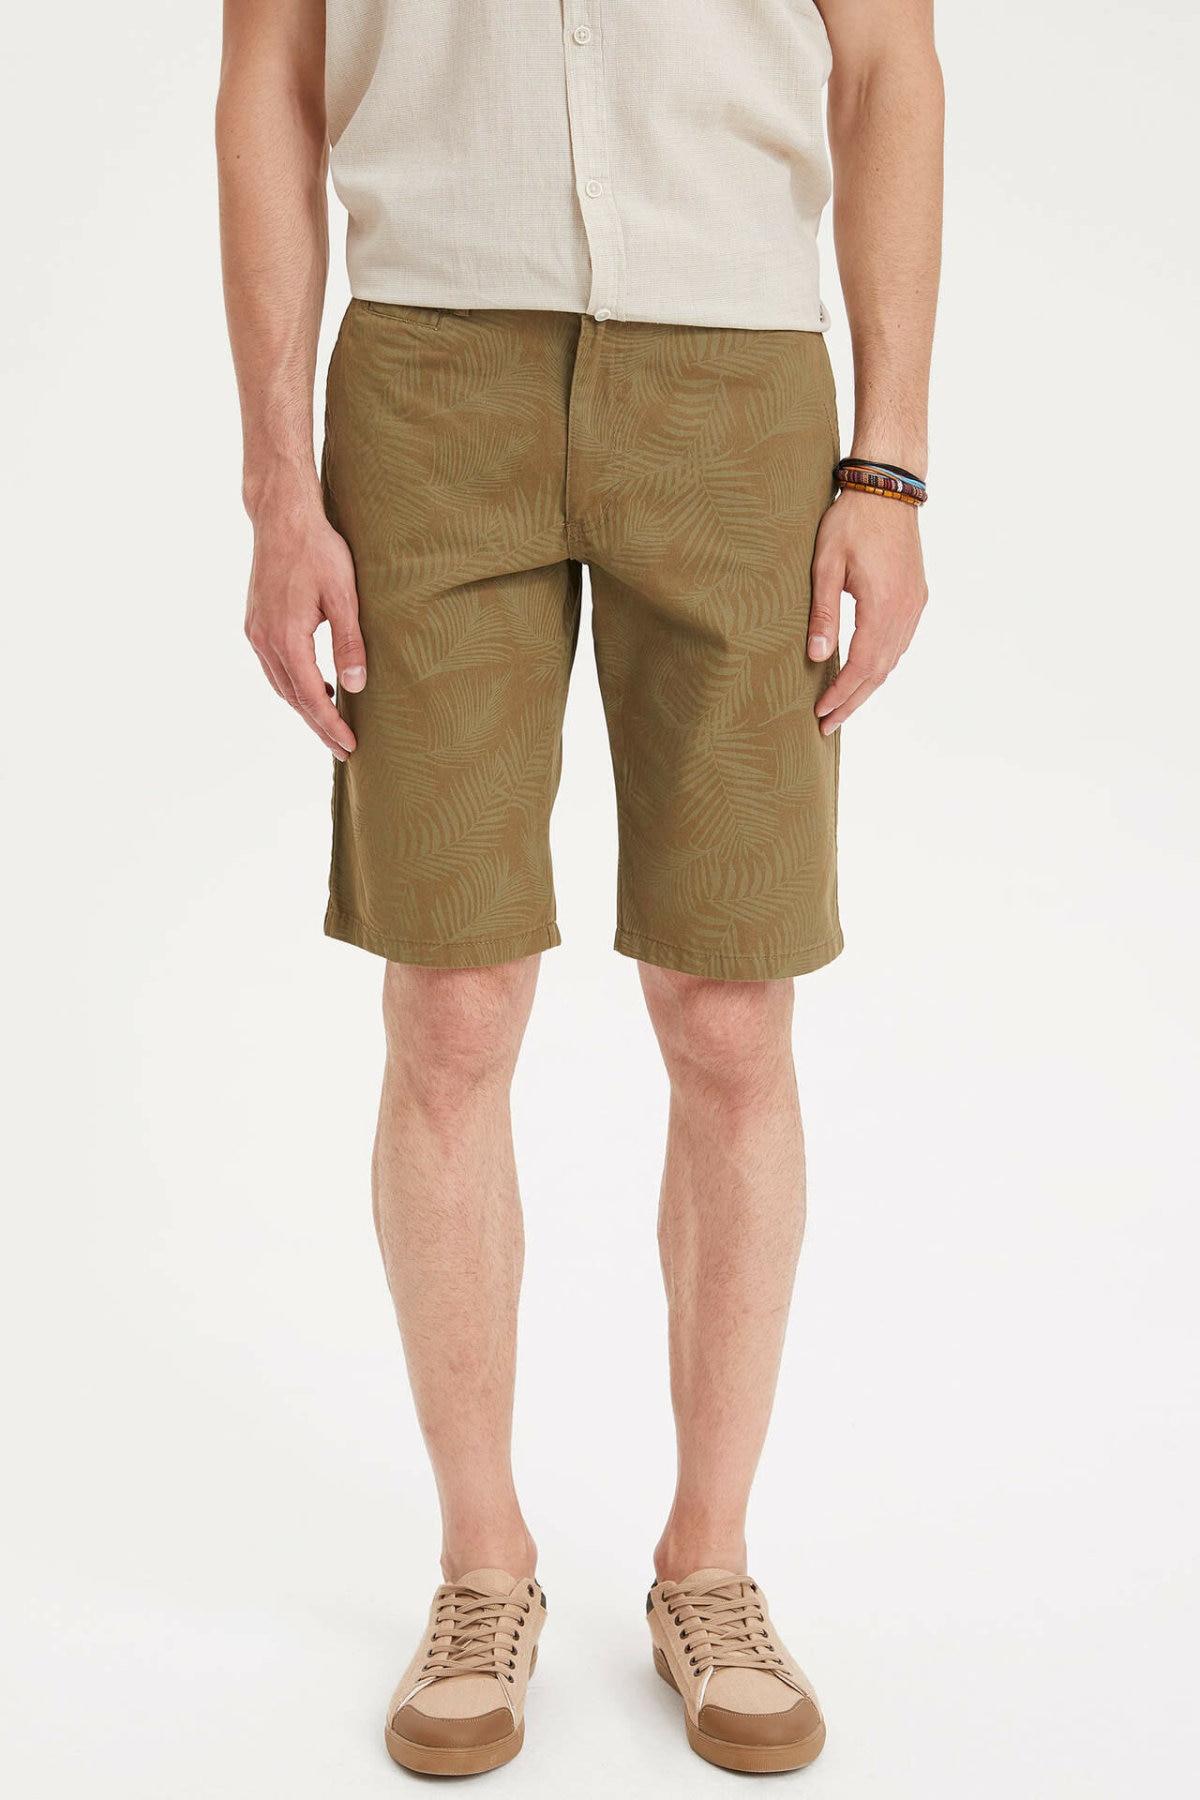 DeFacto Man Summer Army Green Casual Shorts Men Mid-waist Bottom Shorts Male Fit Slim Short-K4203AZ19SM